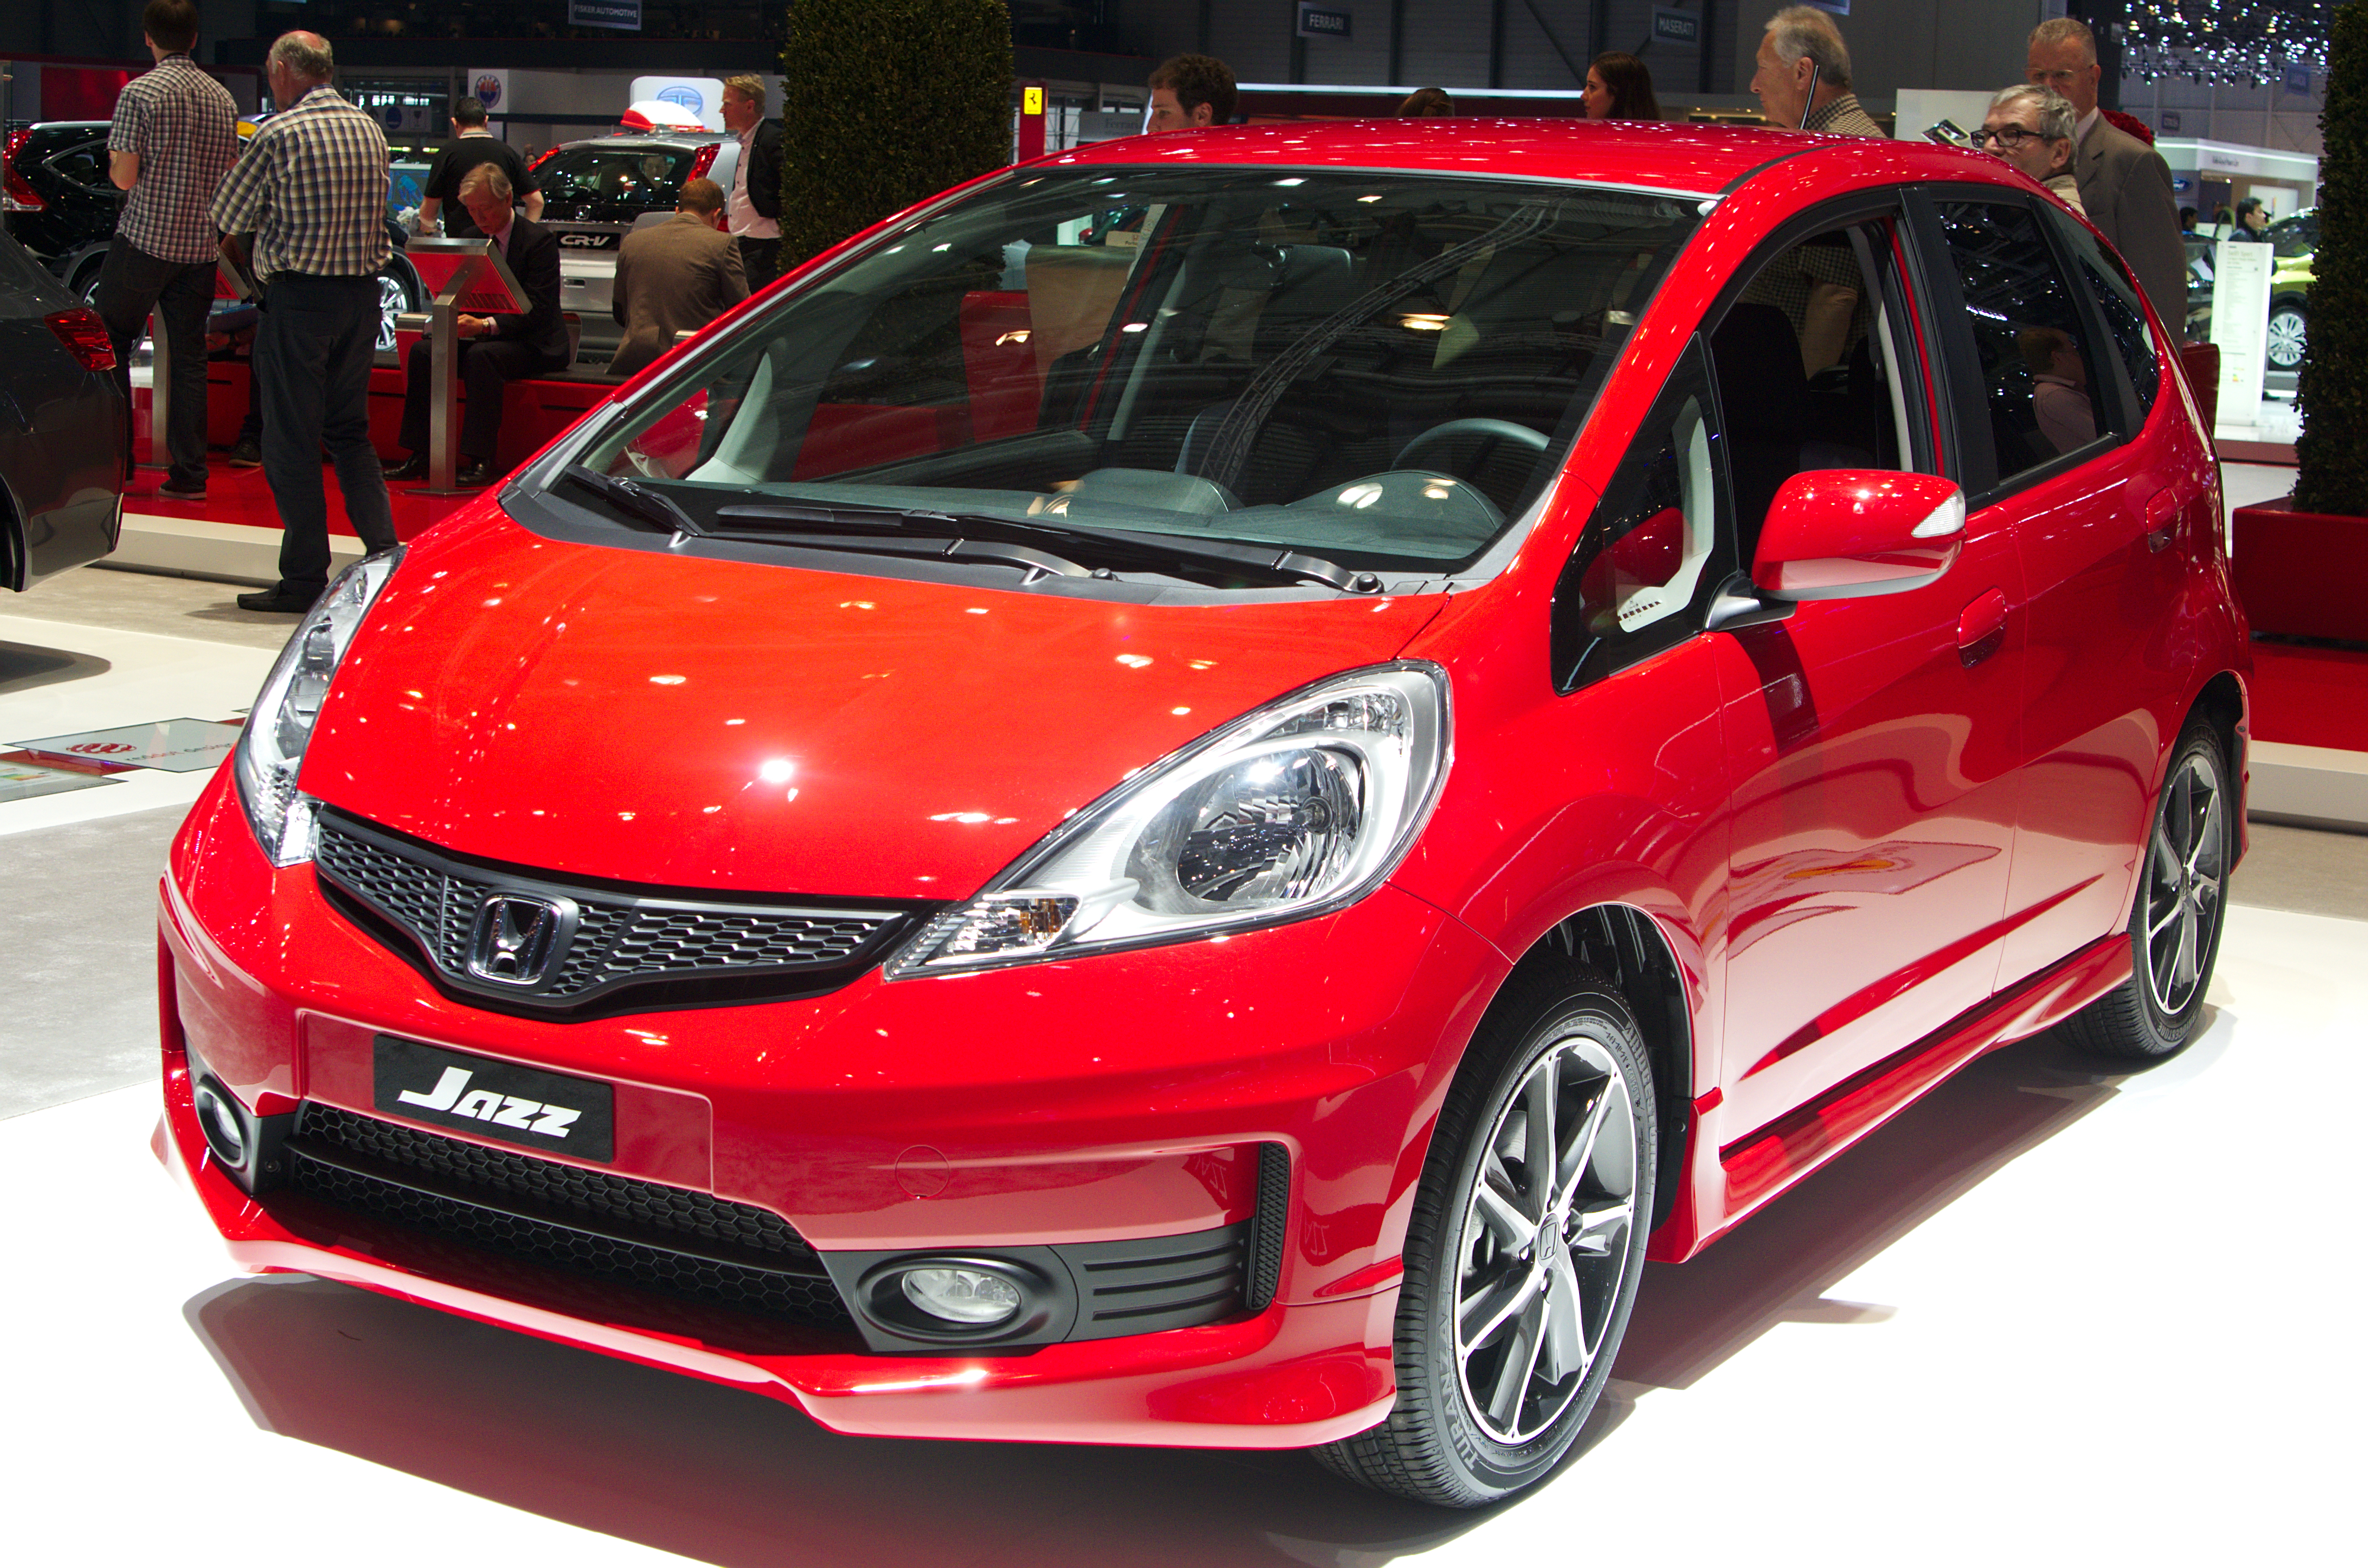 Kekurangan Honda Jazz Rs 2013 Murah Berkualitas